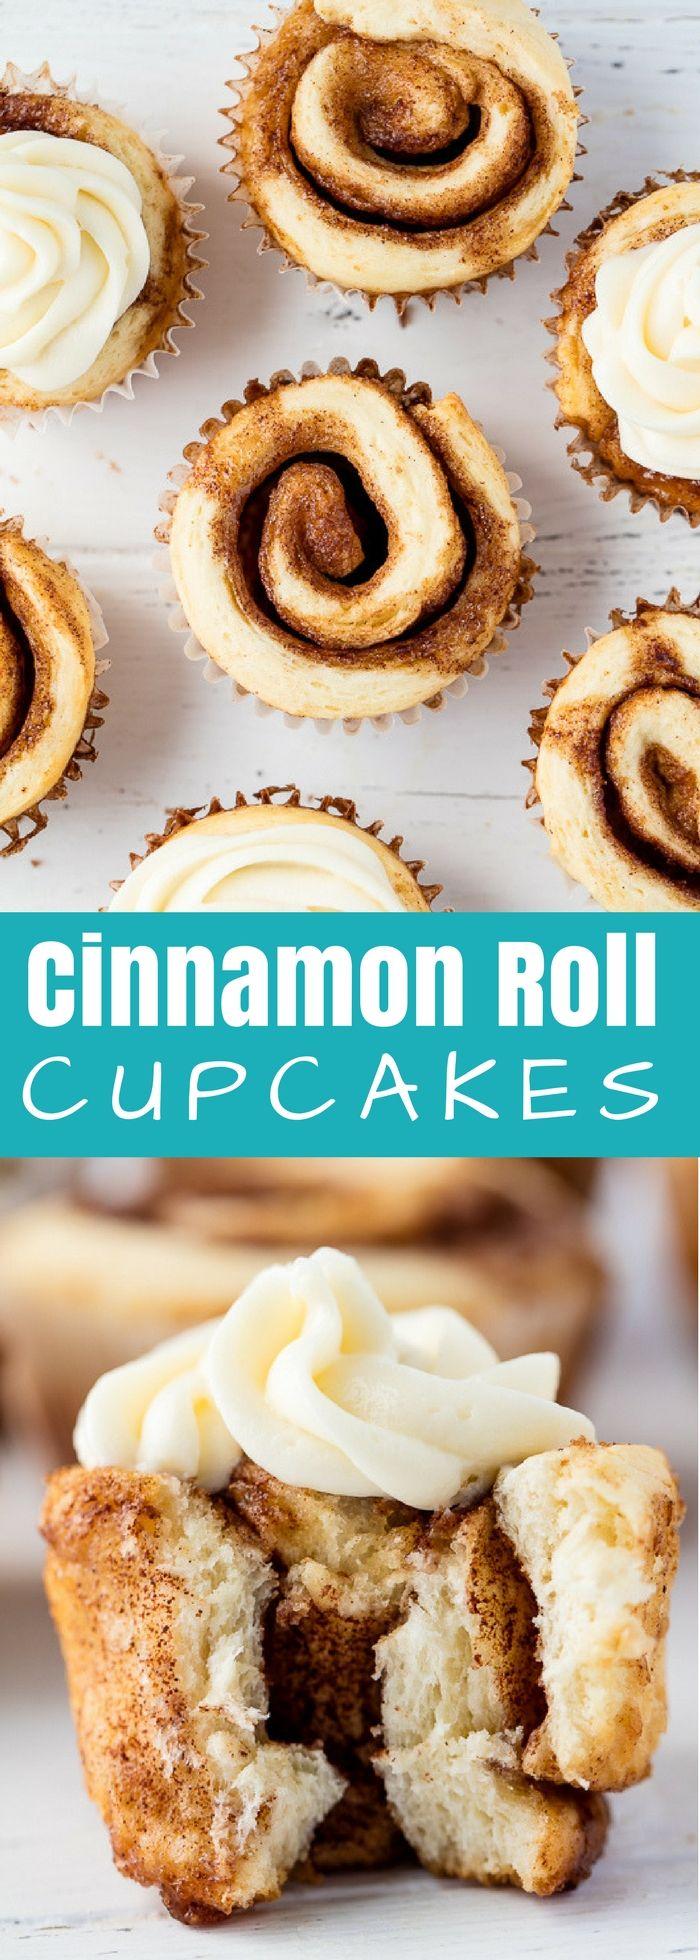 Cinnamon Roll Cupcakes are a fun new